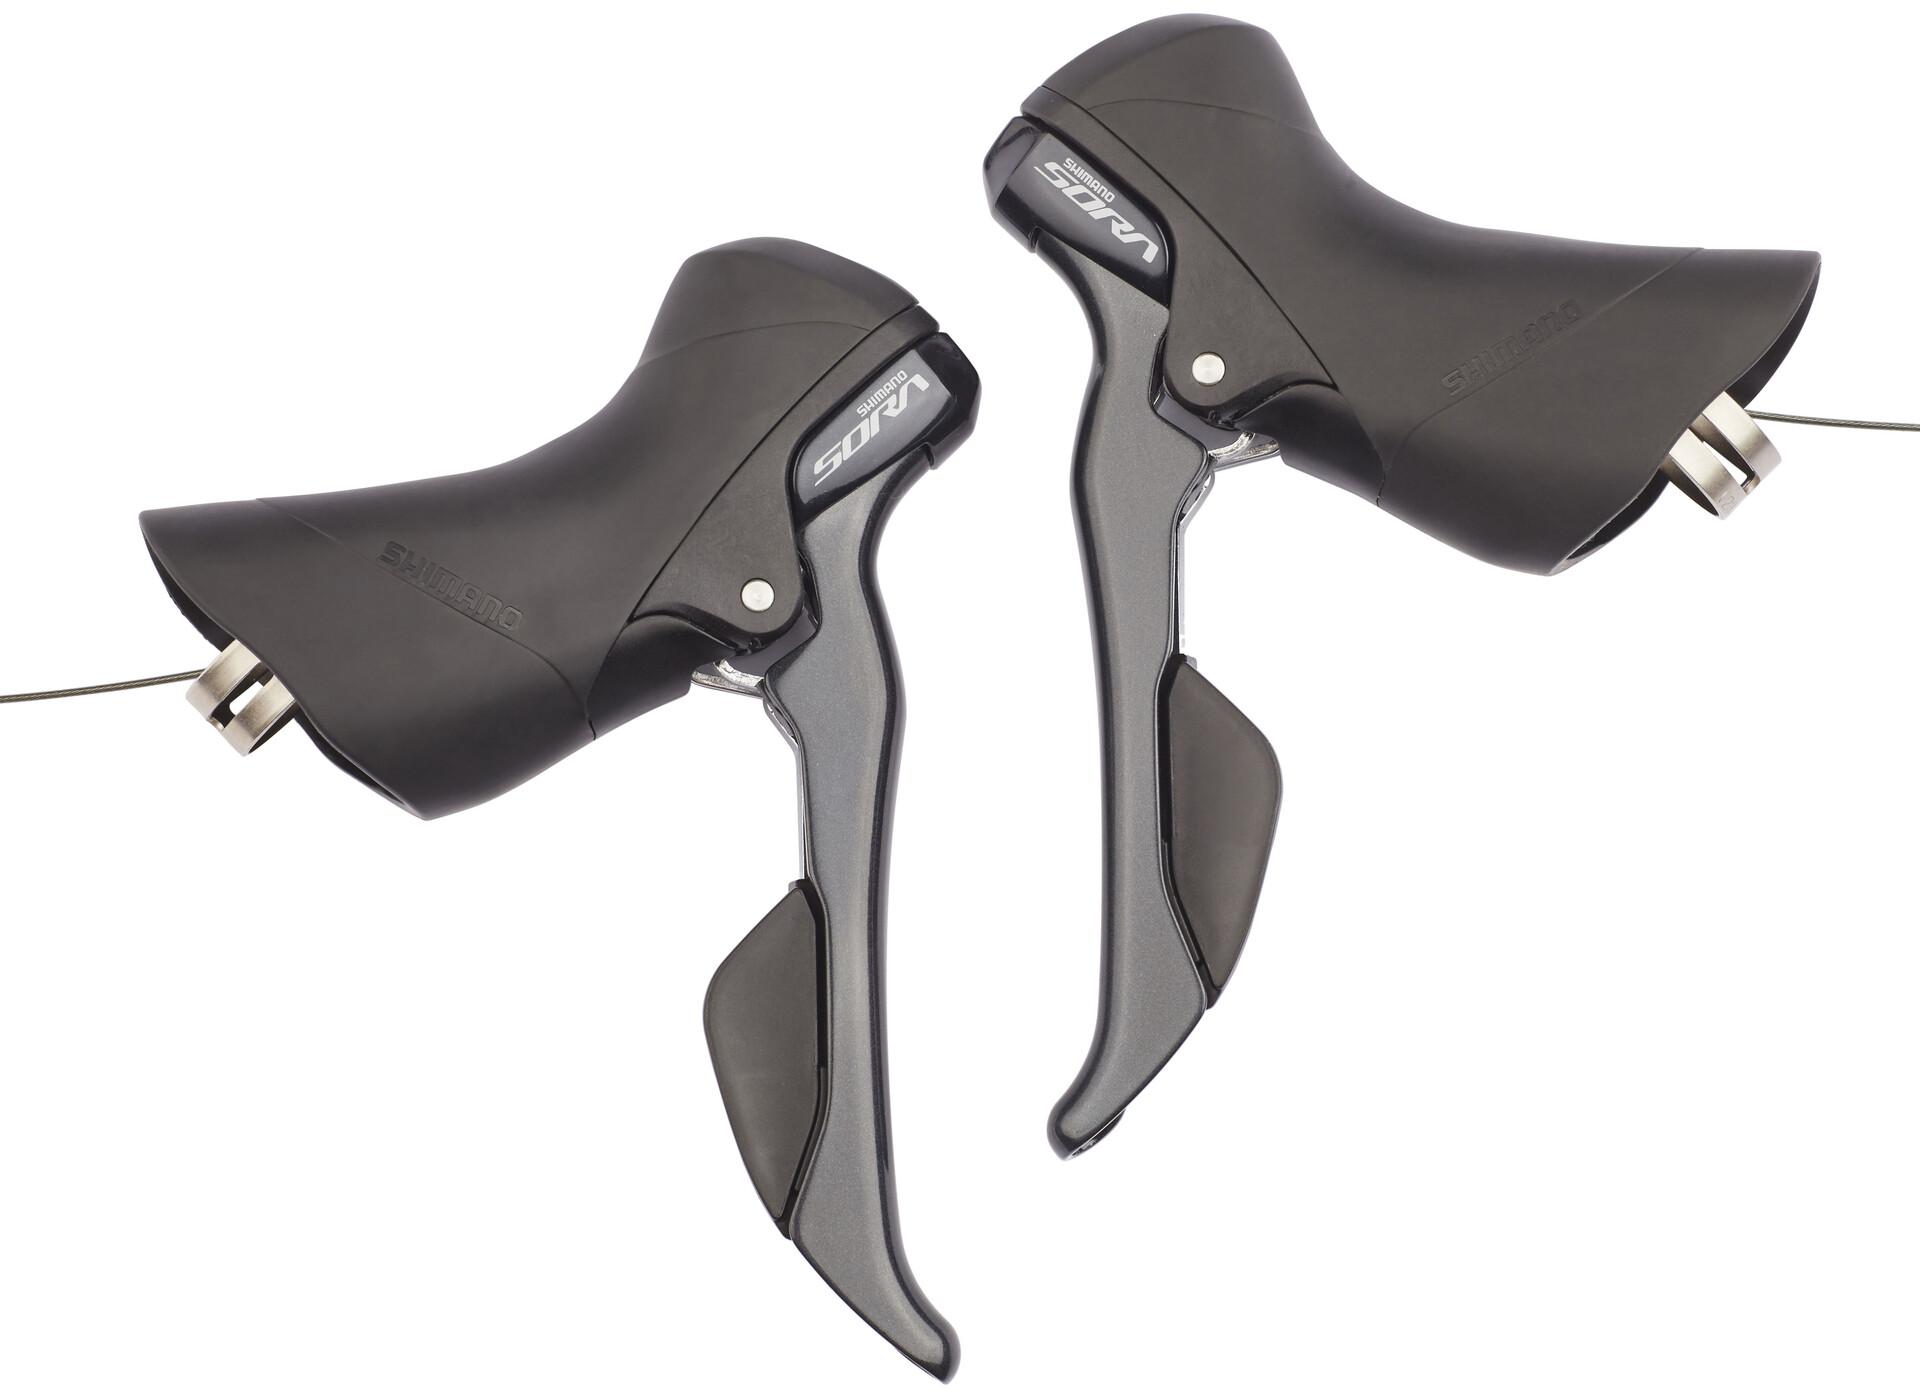 Shimano CLARIS Schalt+Bremshebel ST-R2000 Paar grau